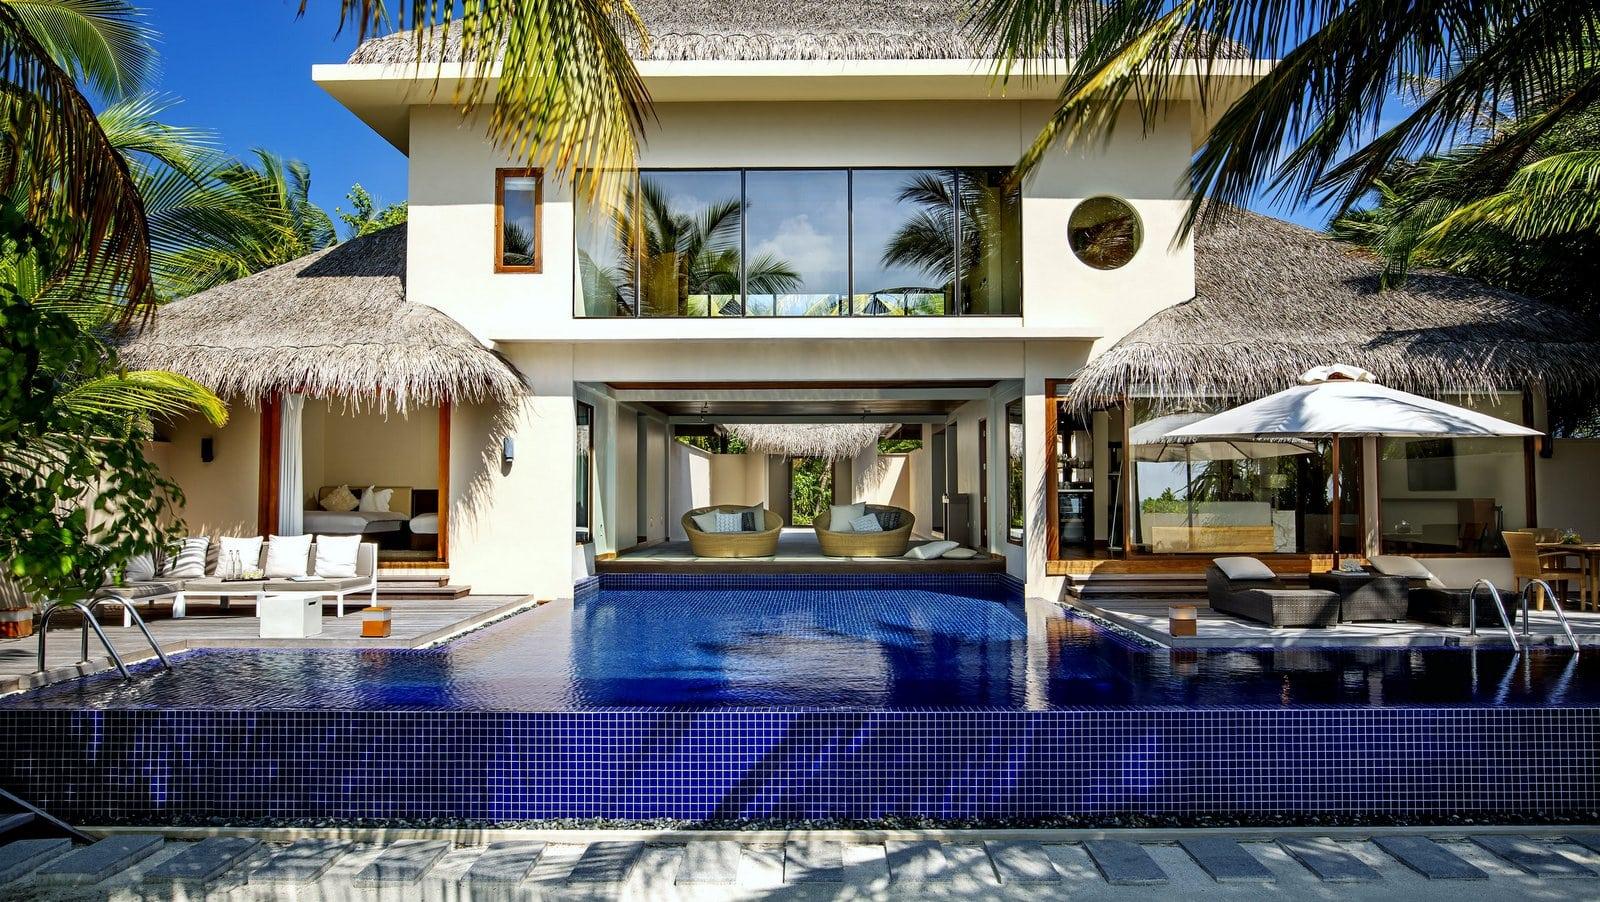 Мальдивы, отель Huvafen Fushi Maldives, номер Two Bed Room Beach Pavilion with Pool